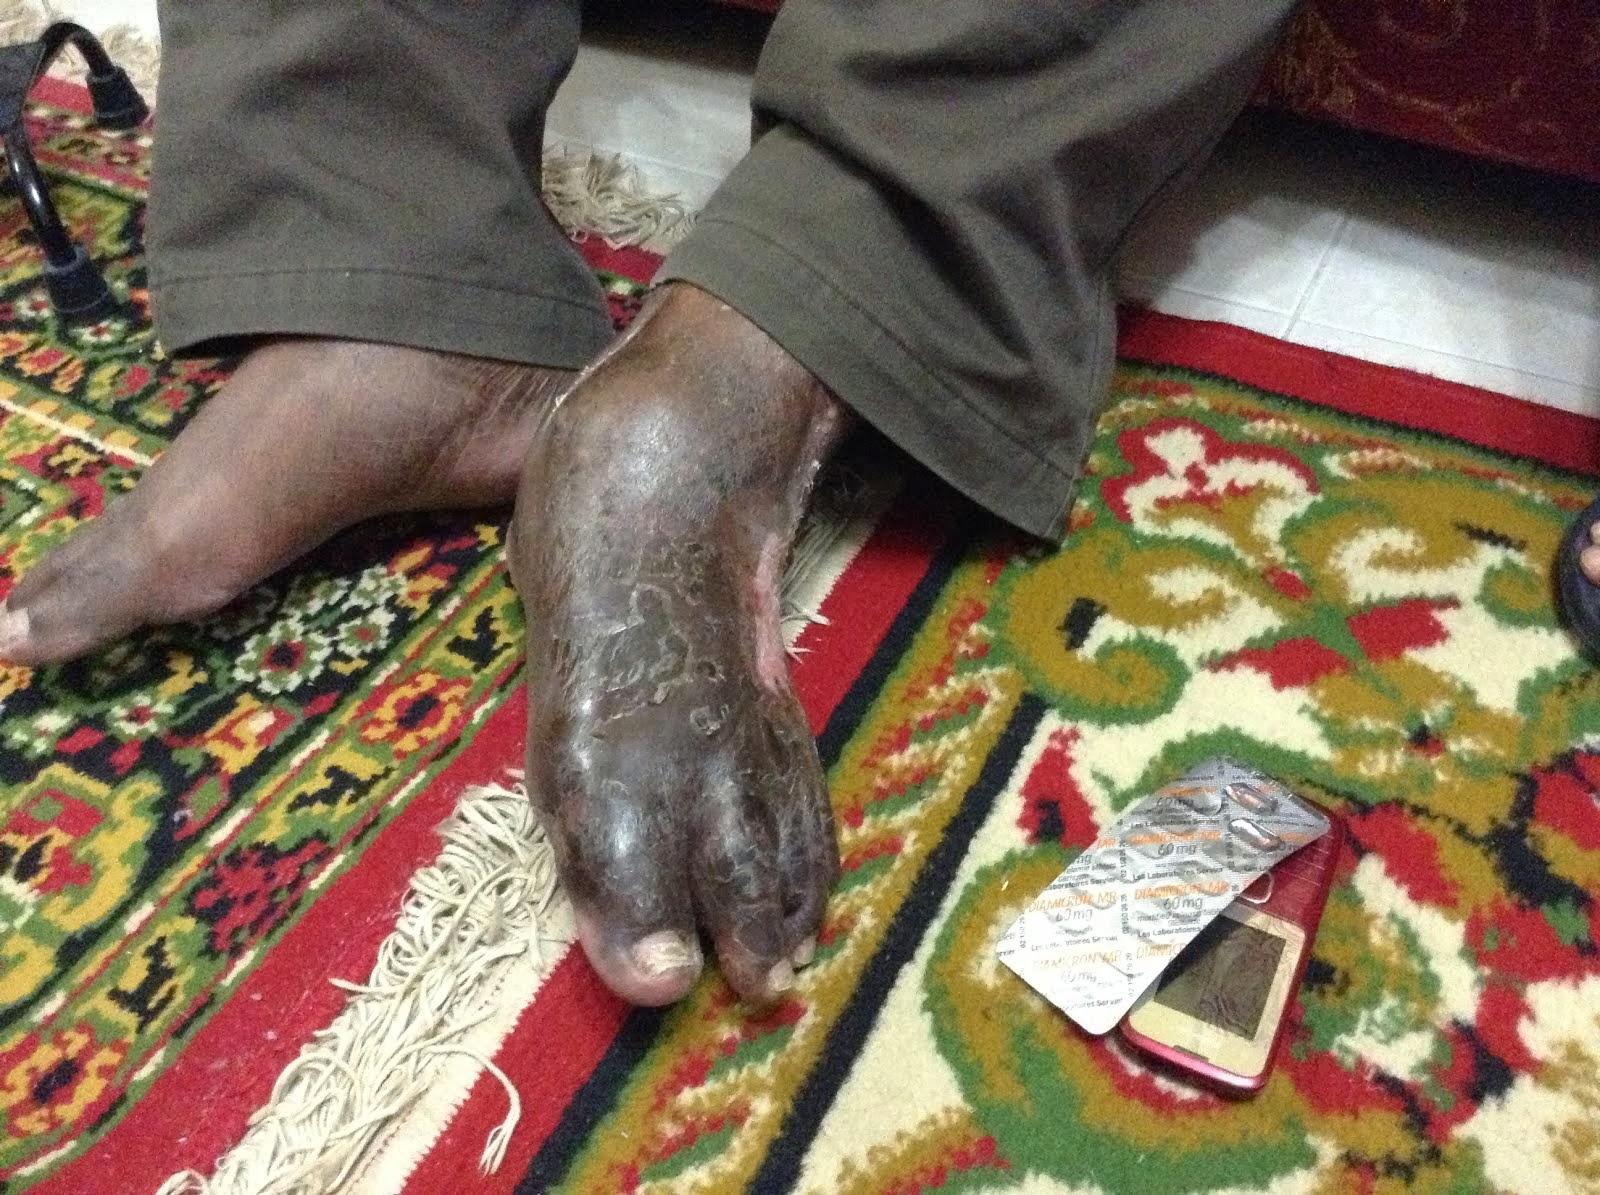 Diabetis - Bacaan 'monitoring system' menurun KELEBIHAN JANAMA MALAYSIA